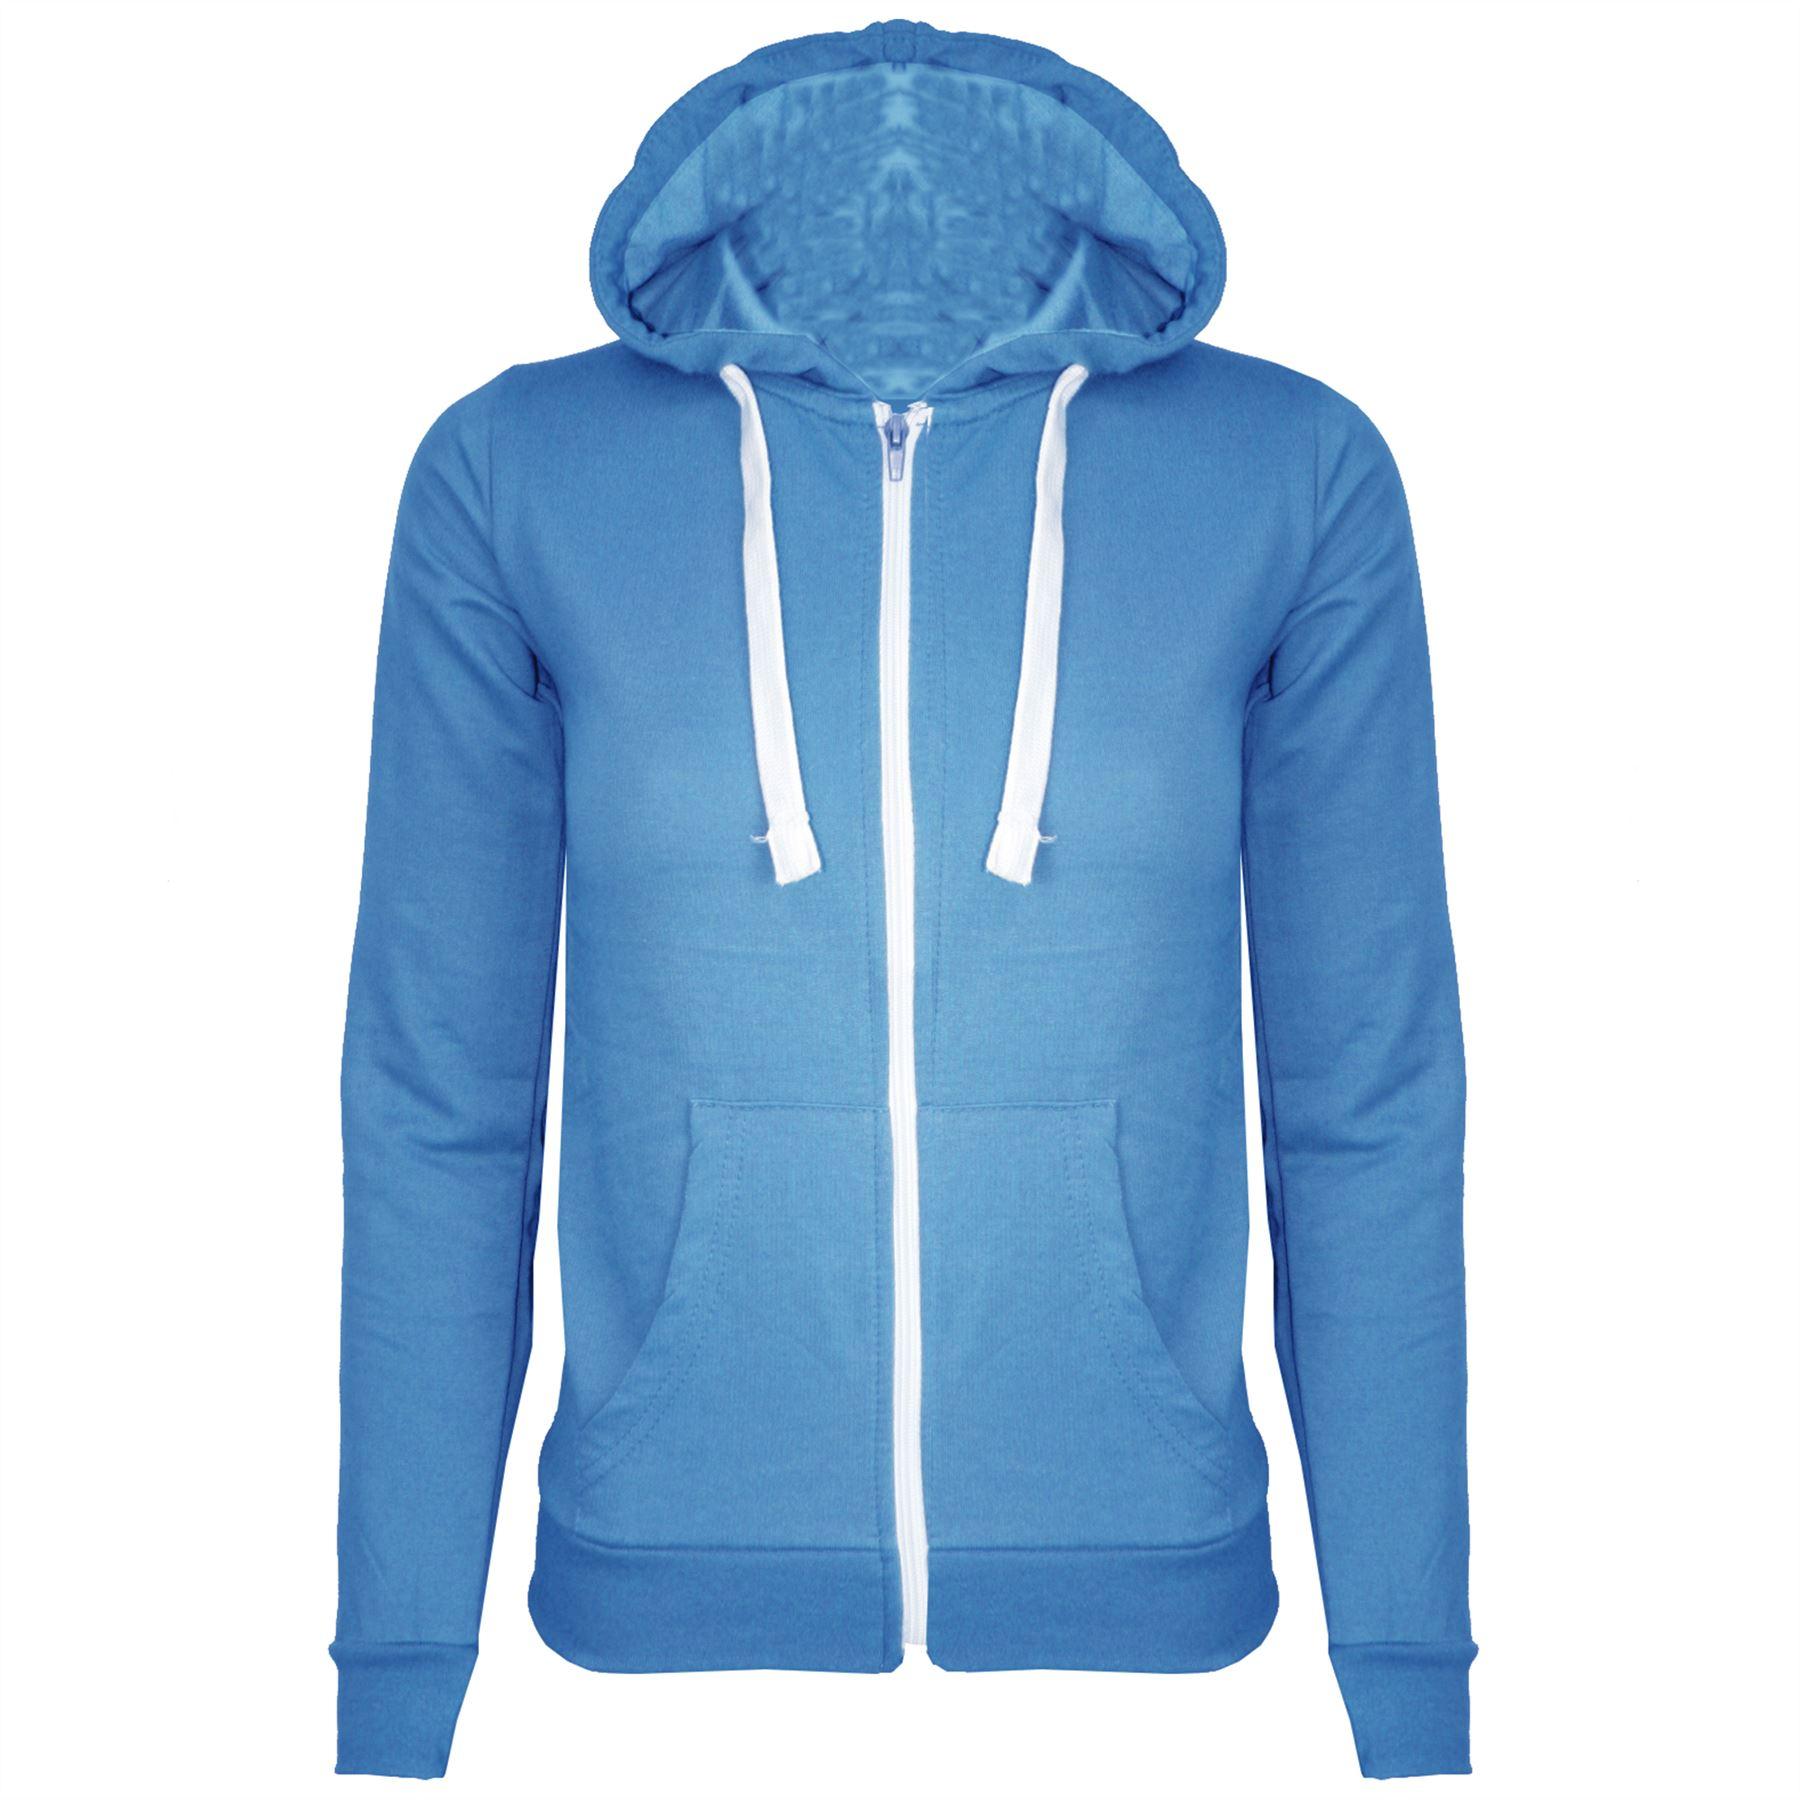 New Womens Ladies Hoodie Plain Zip Up Hooded Top Jacket Size S M L XL 8 10 12 14